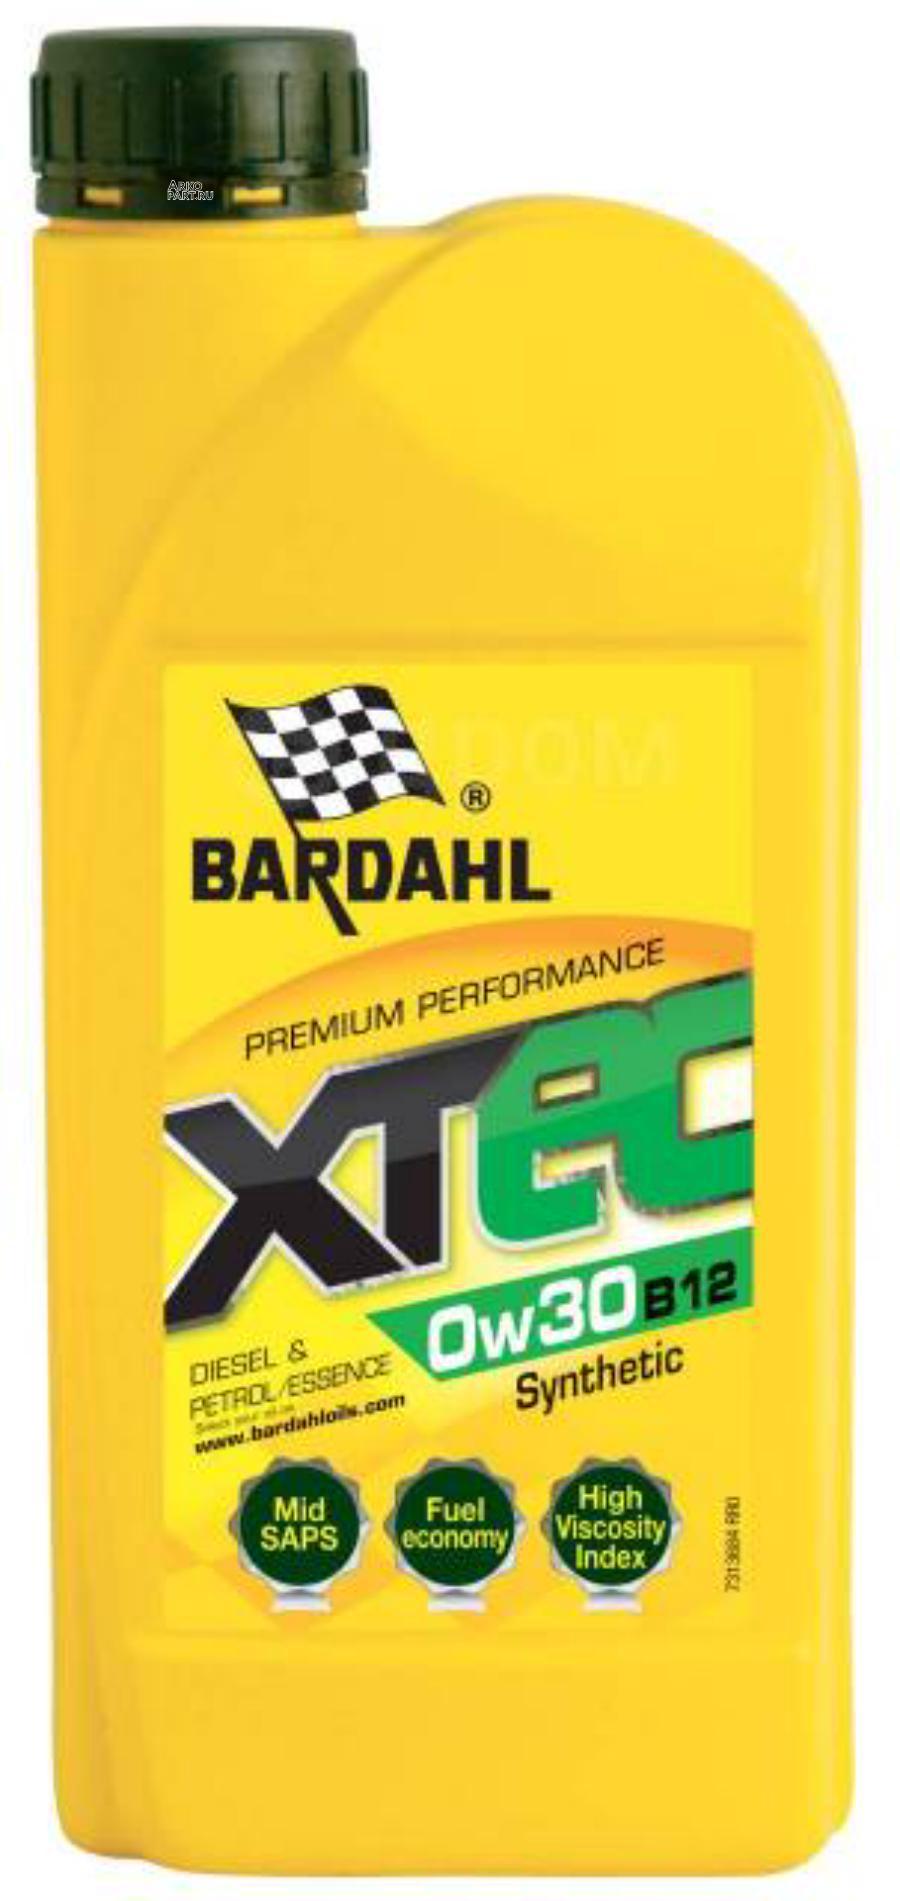 XTEC 0W30 B12 ACEA C2 (12) - BMW LL-12 FE 1L (специальное синт. моторное масло)